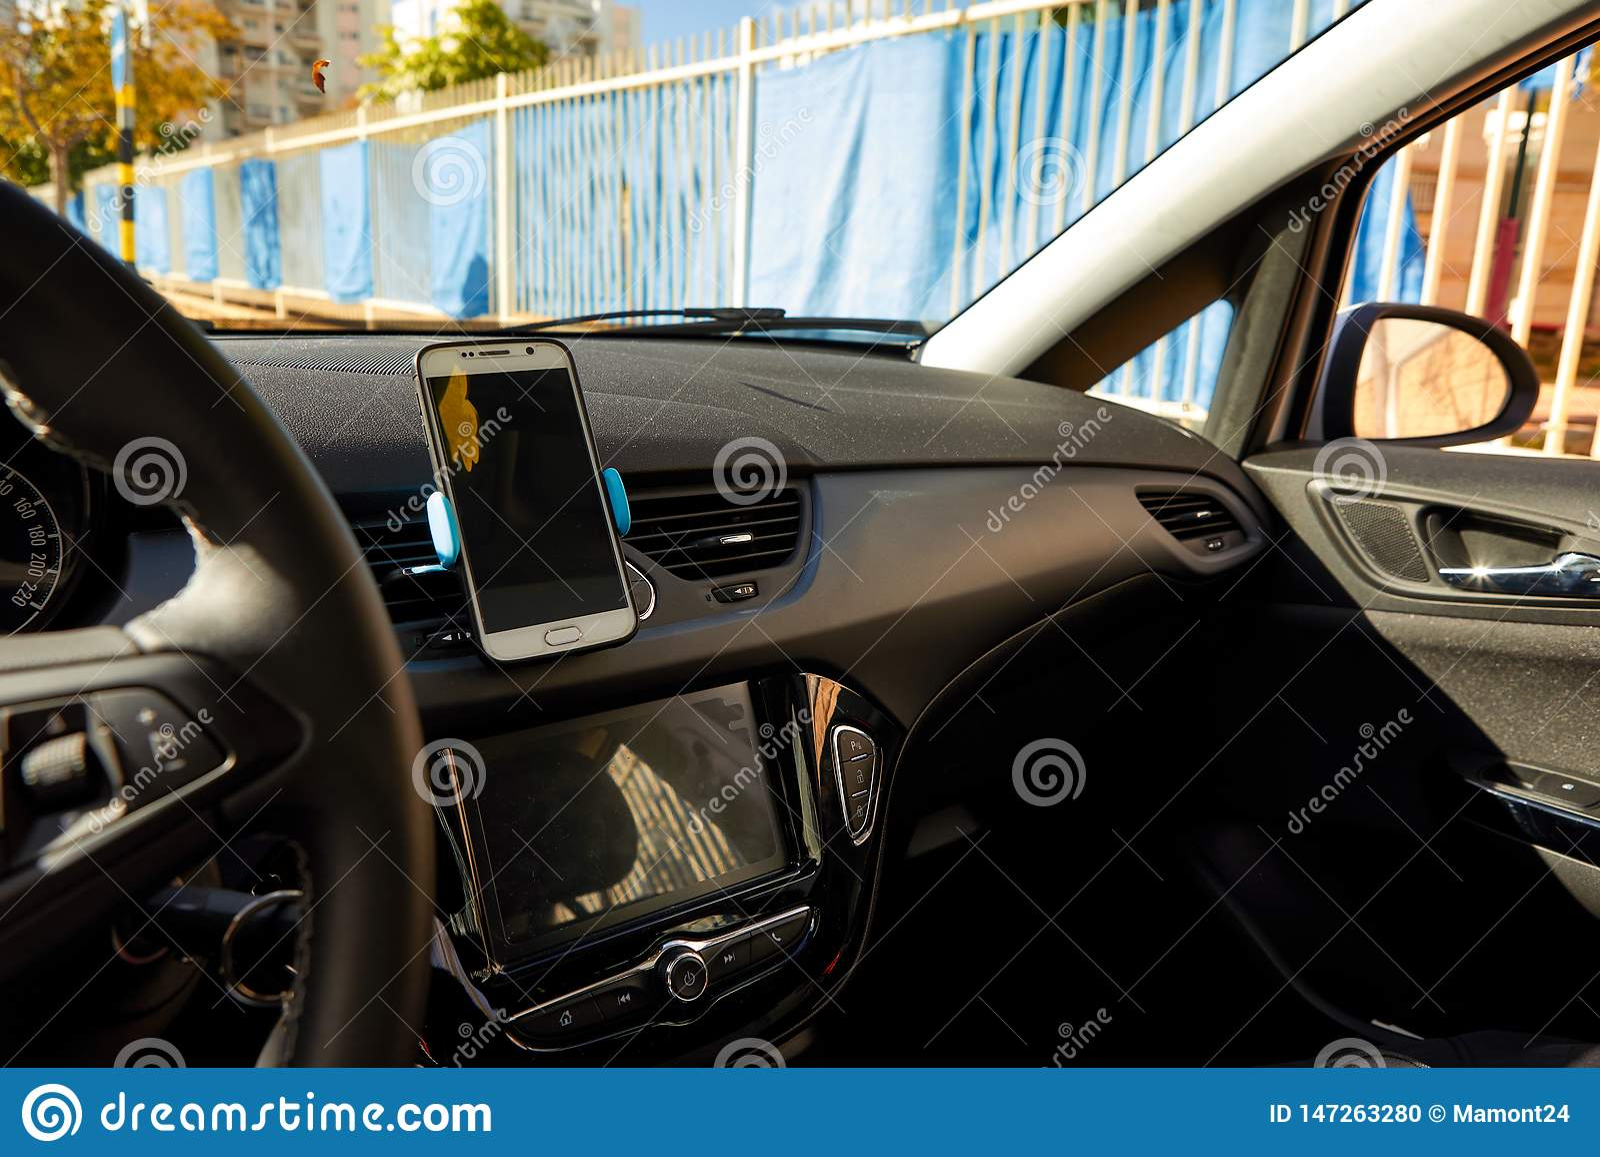 Universal mount holder for smart phones